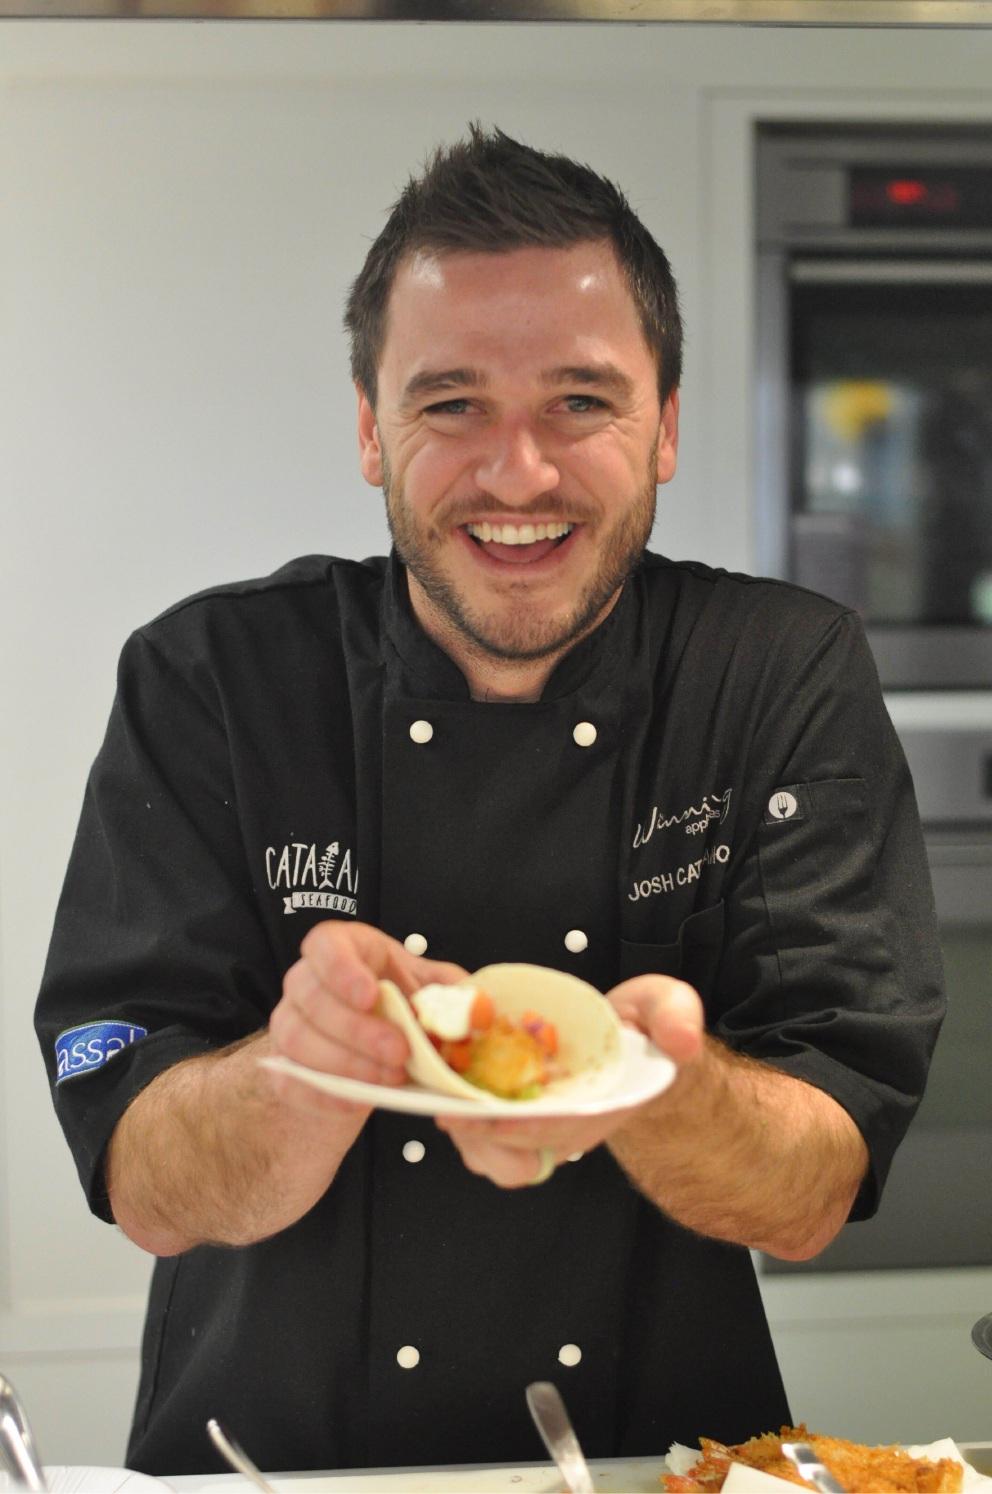 Josh Catalano dishes up a seafood treat.